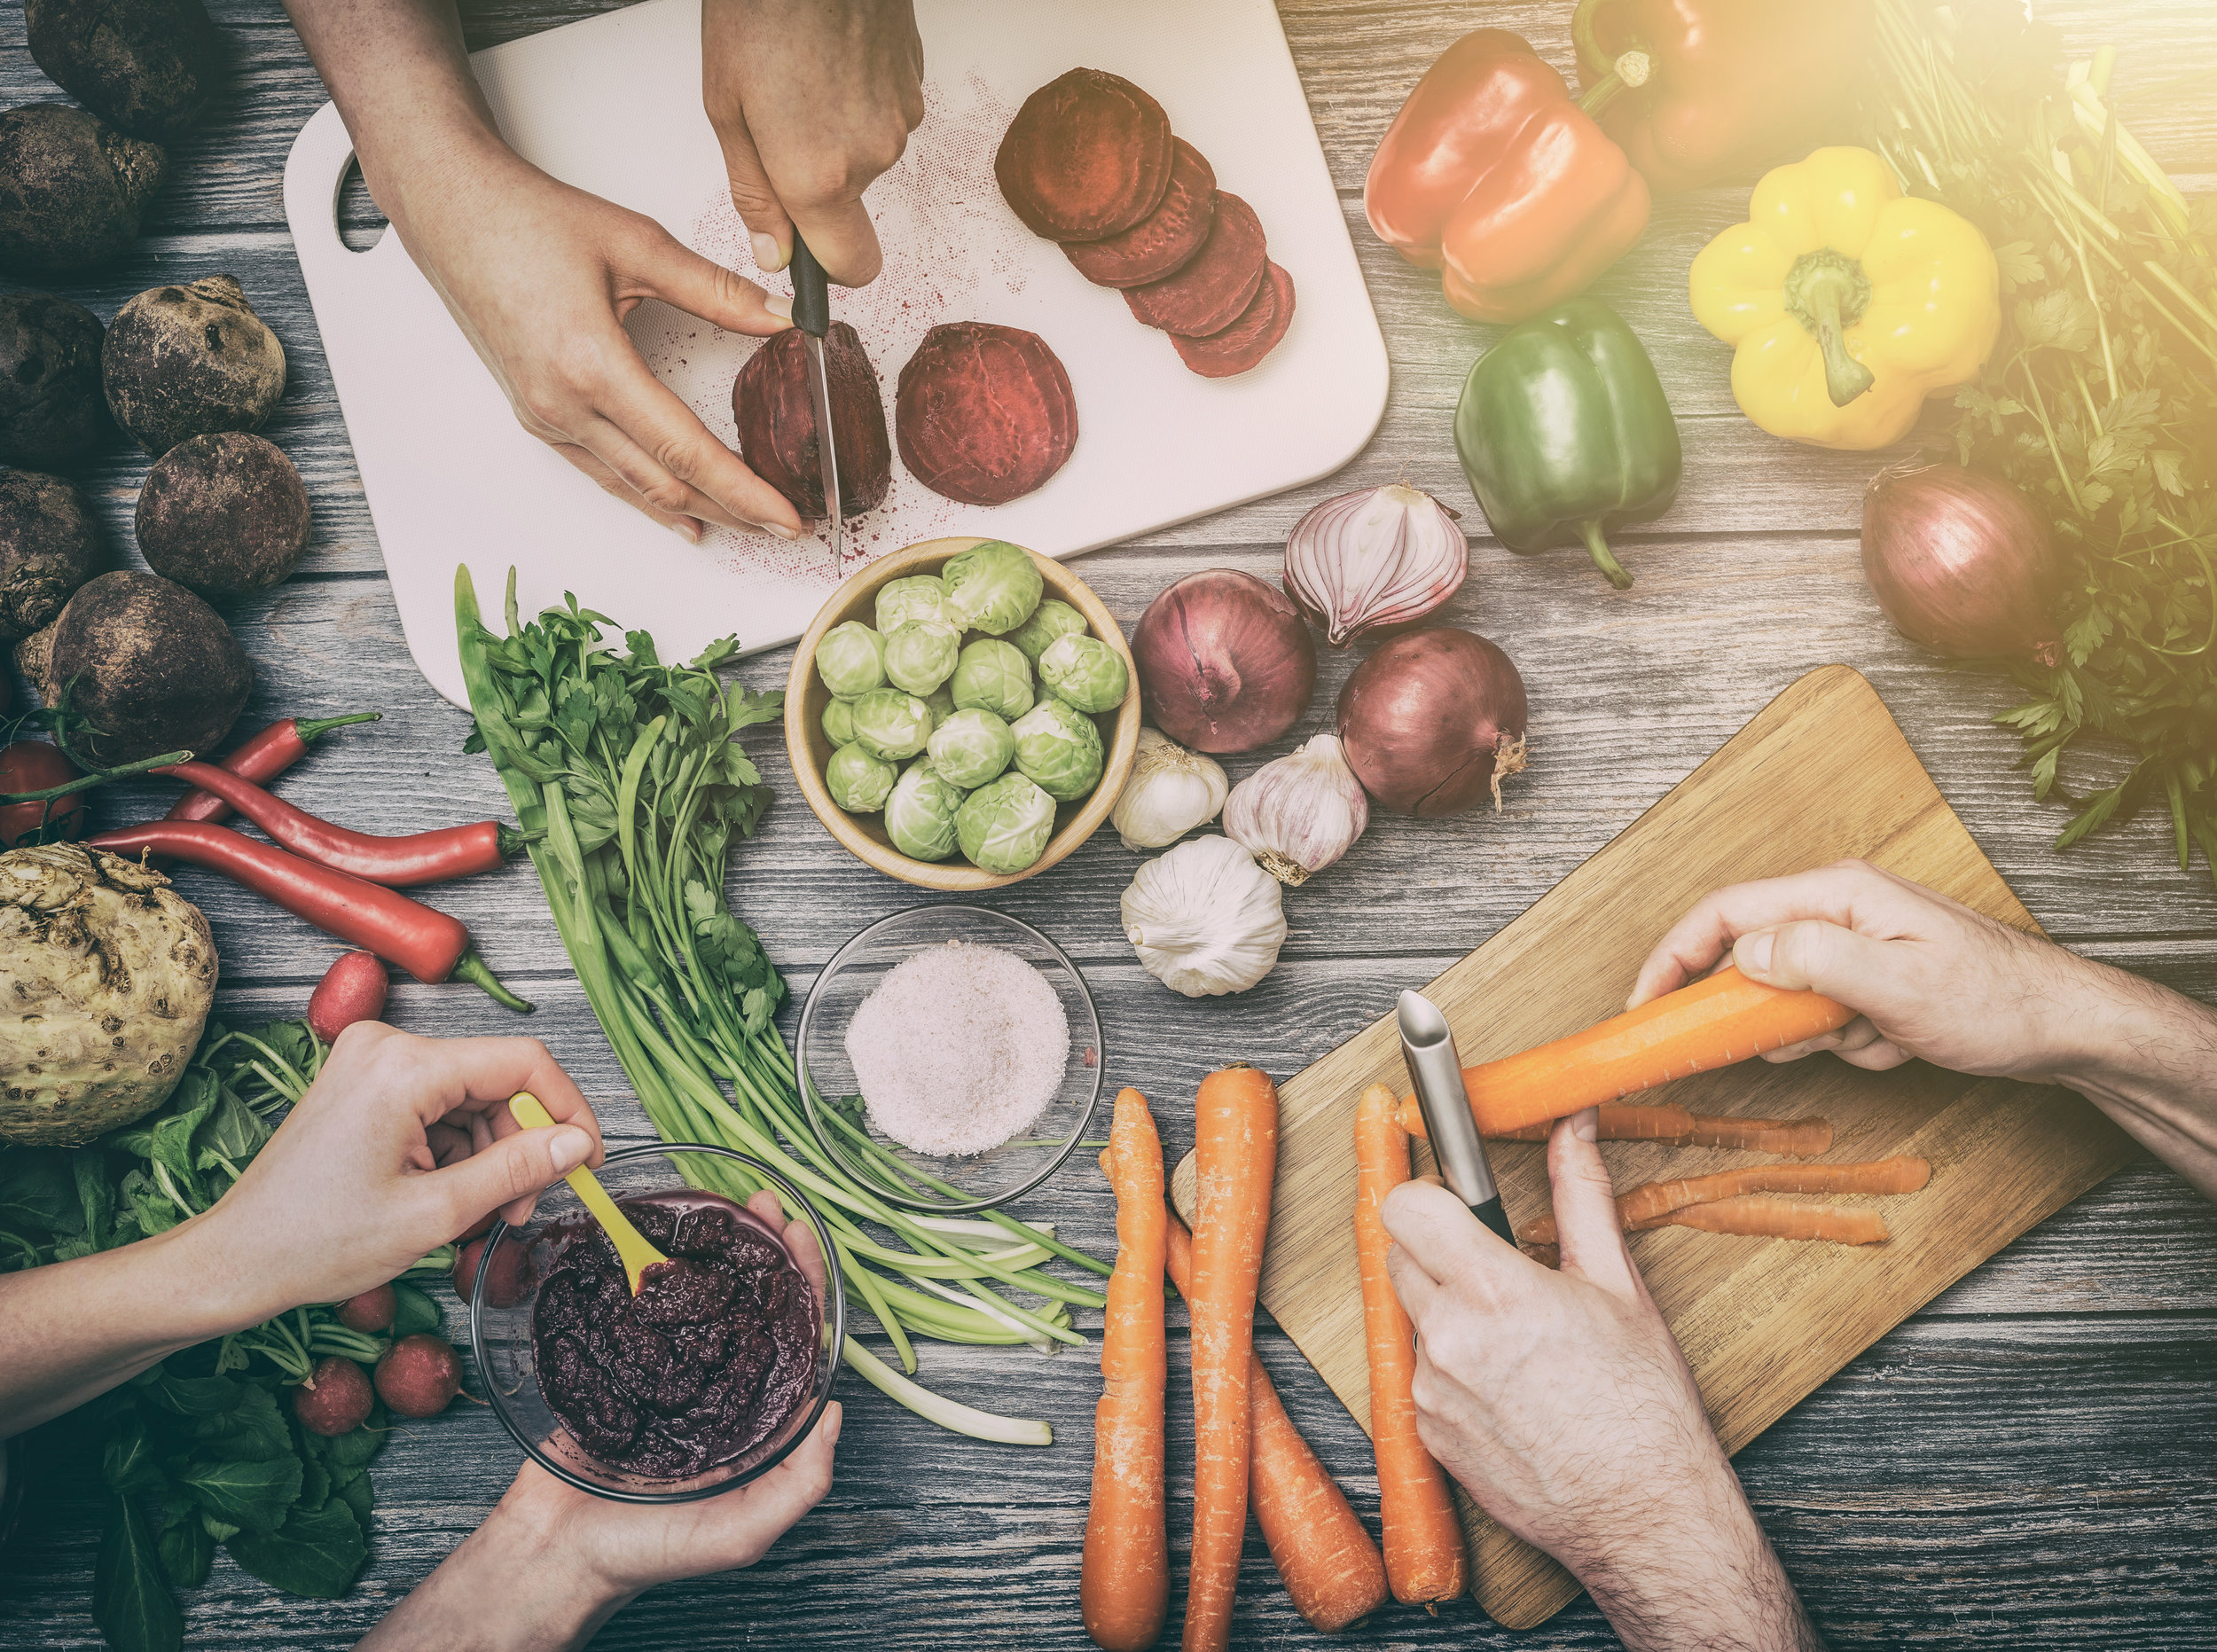 Preparing vegetables for a meal.